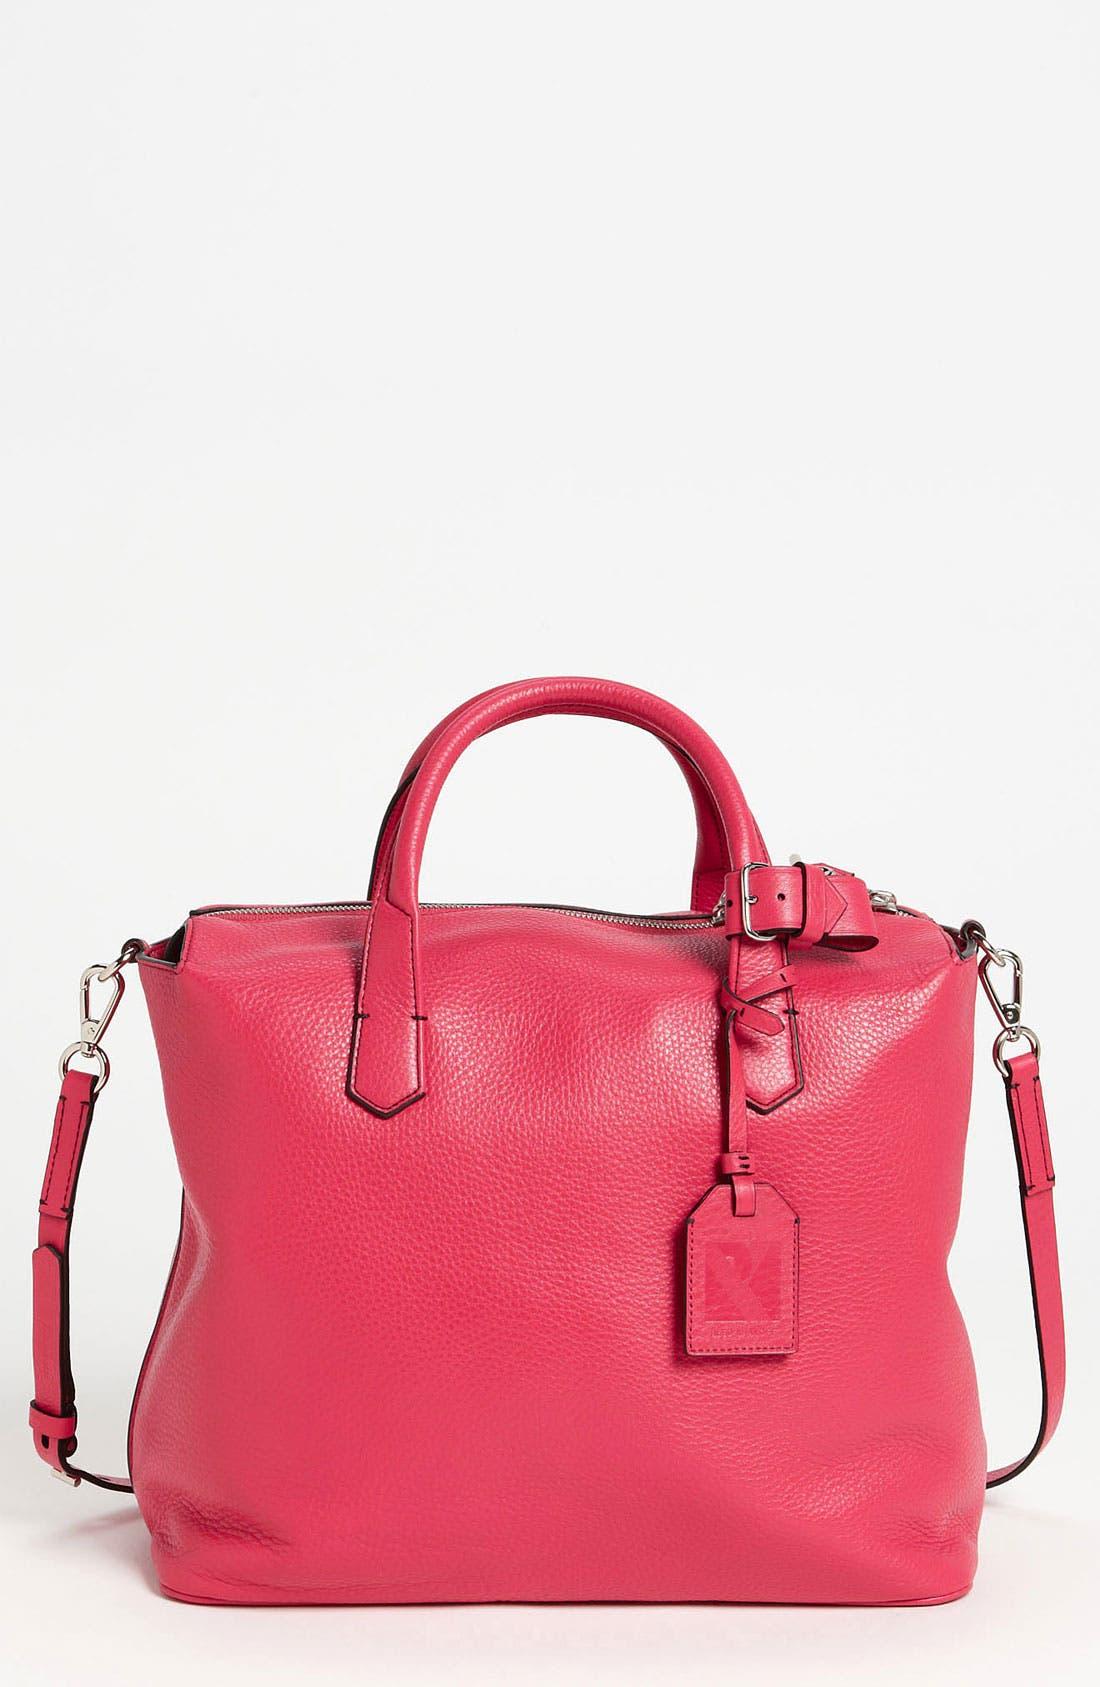 Main Image - Reed Krakoff 'Gym Bag' Leather Satchel